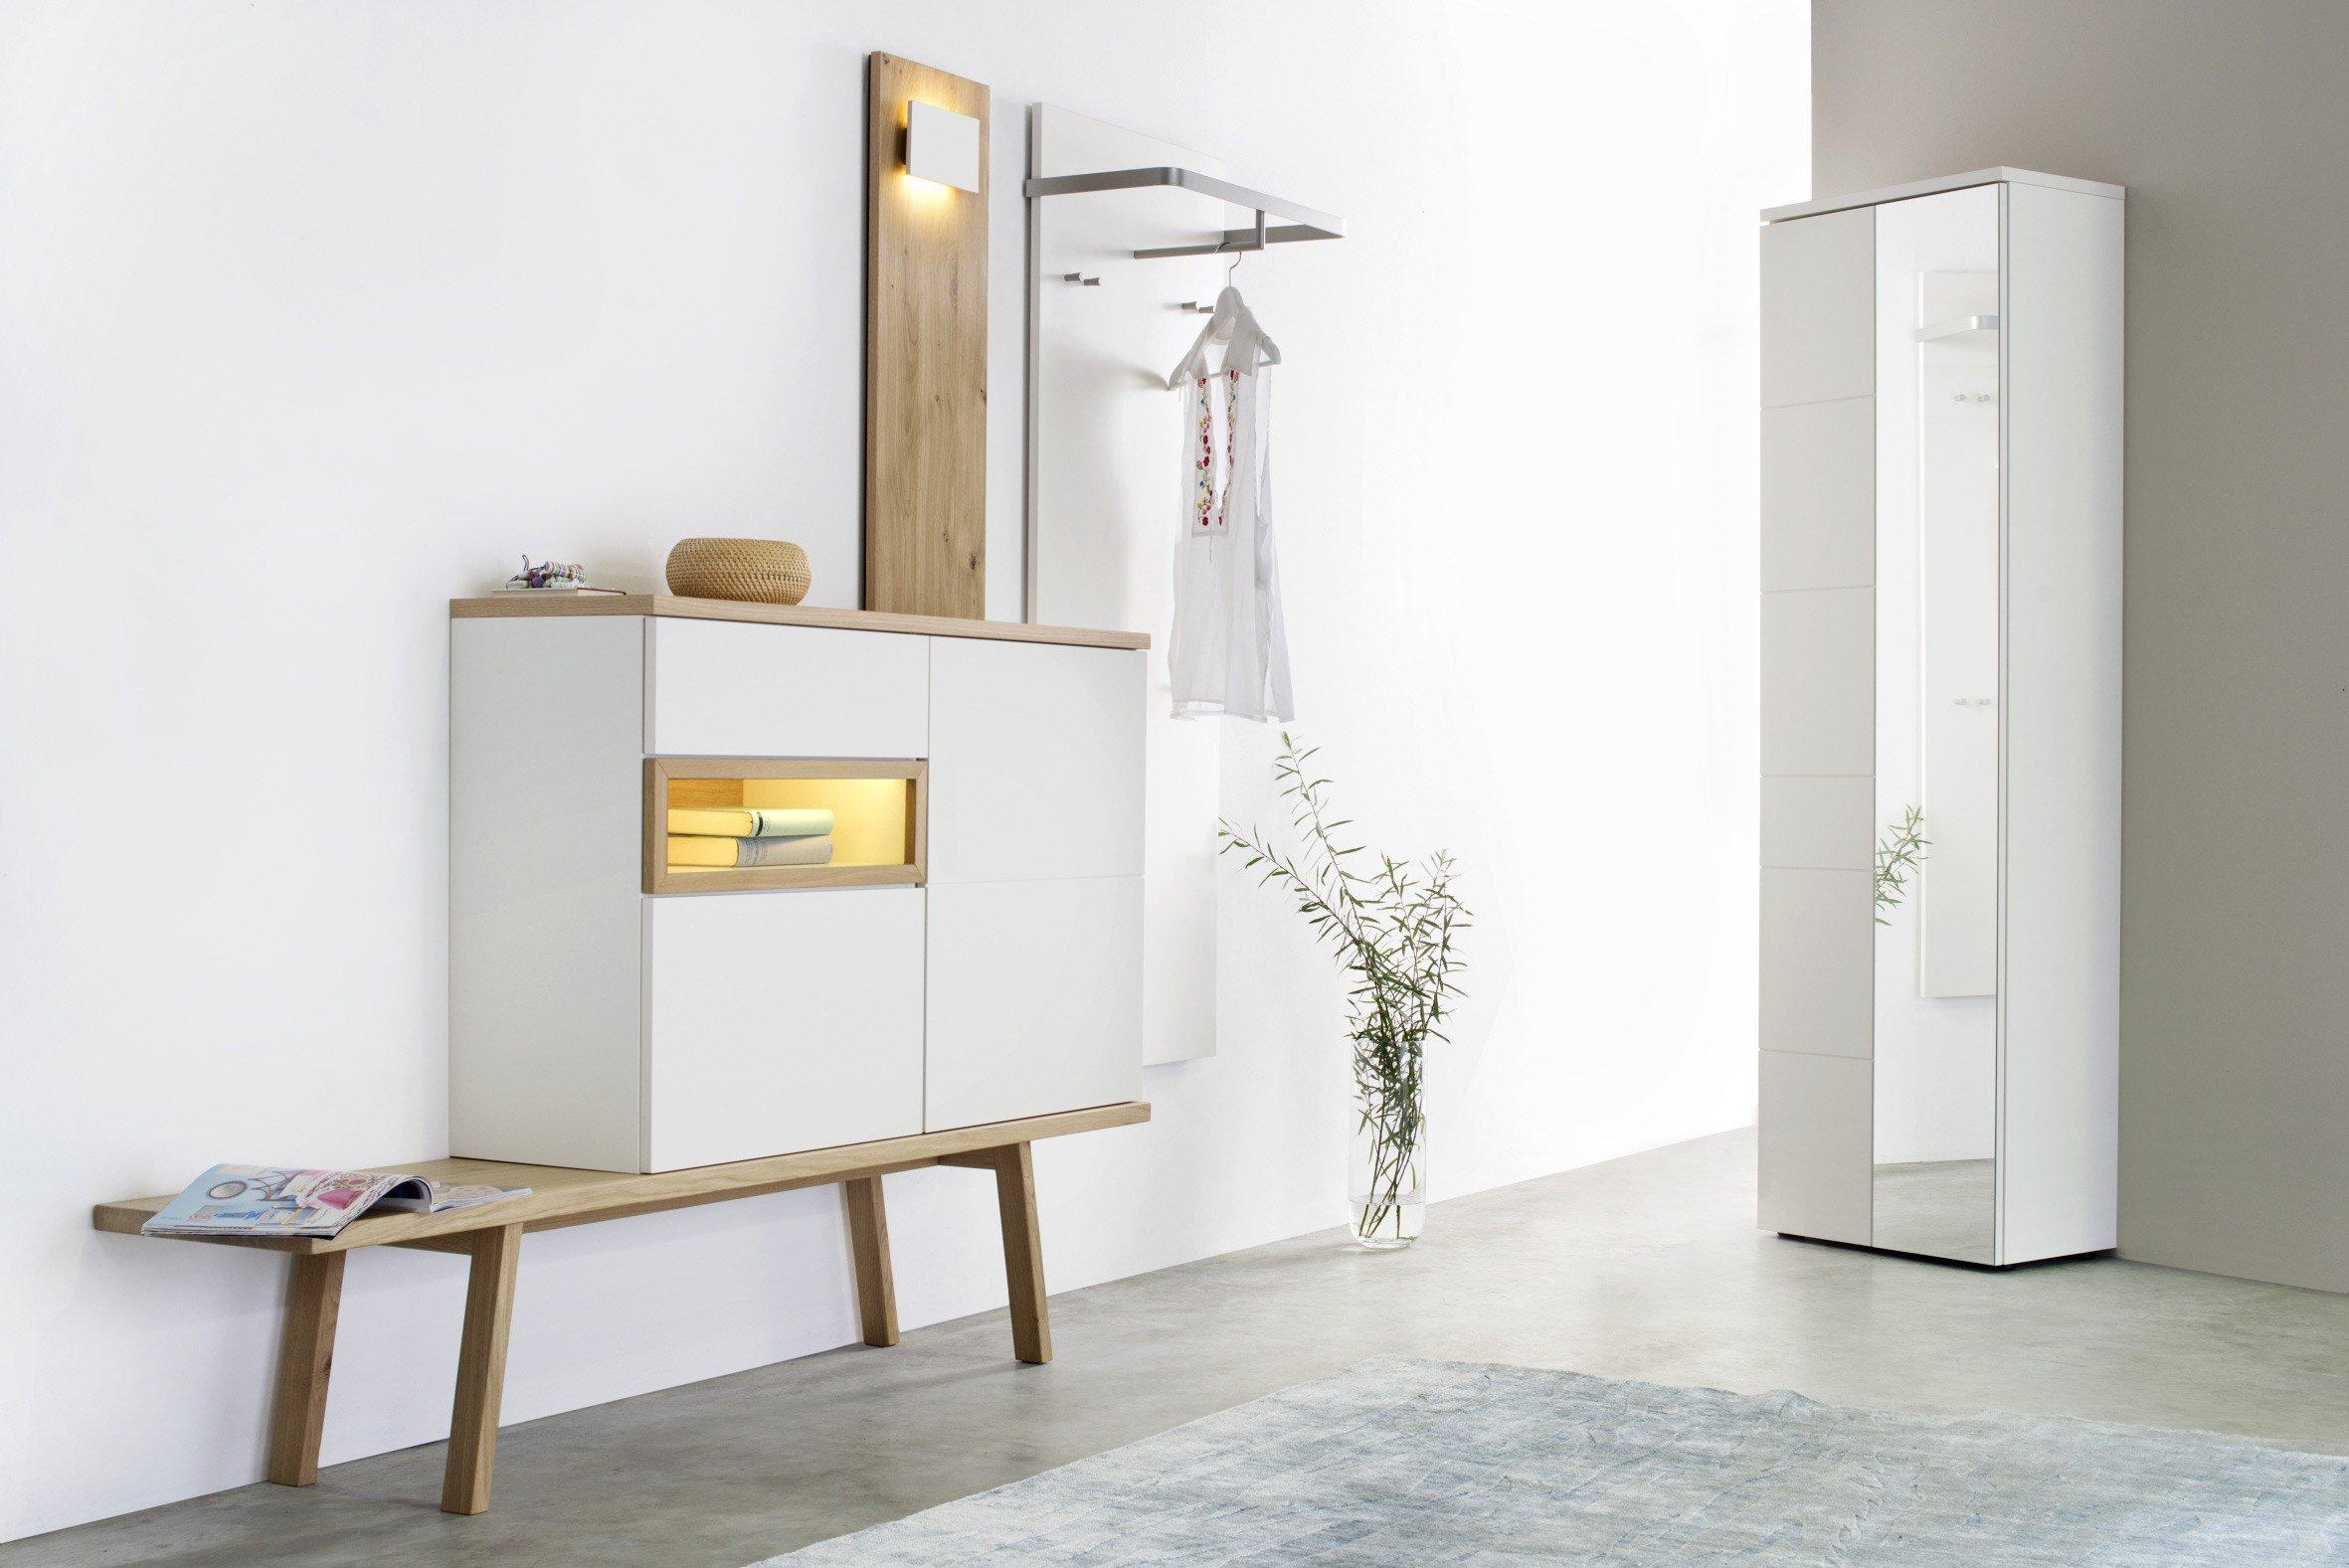 skandinavische garderobe fia 04 m bel letz ihr online shop. Black Bedroom Furniture Sets. Home Design Ideas